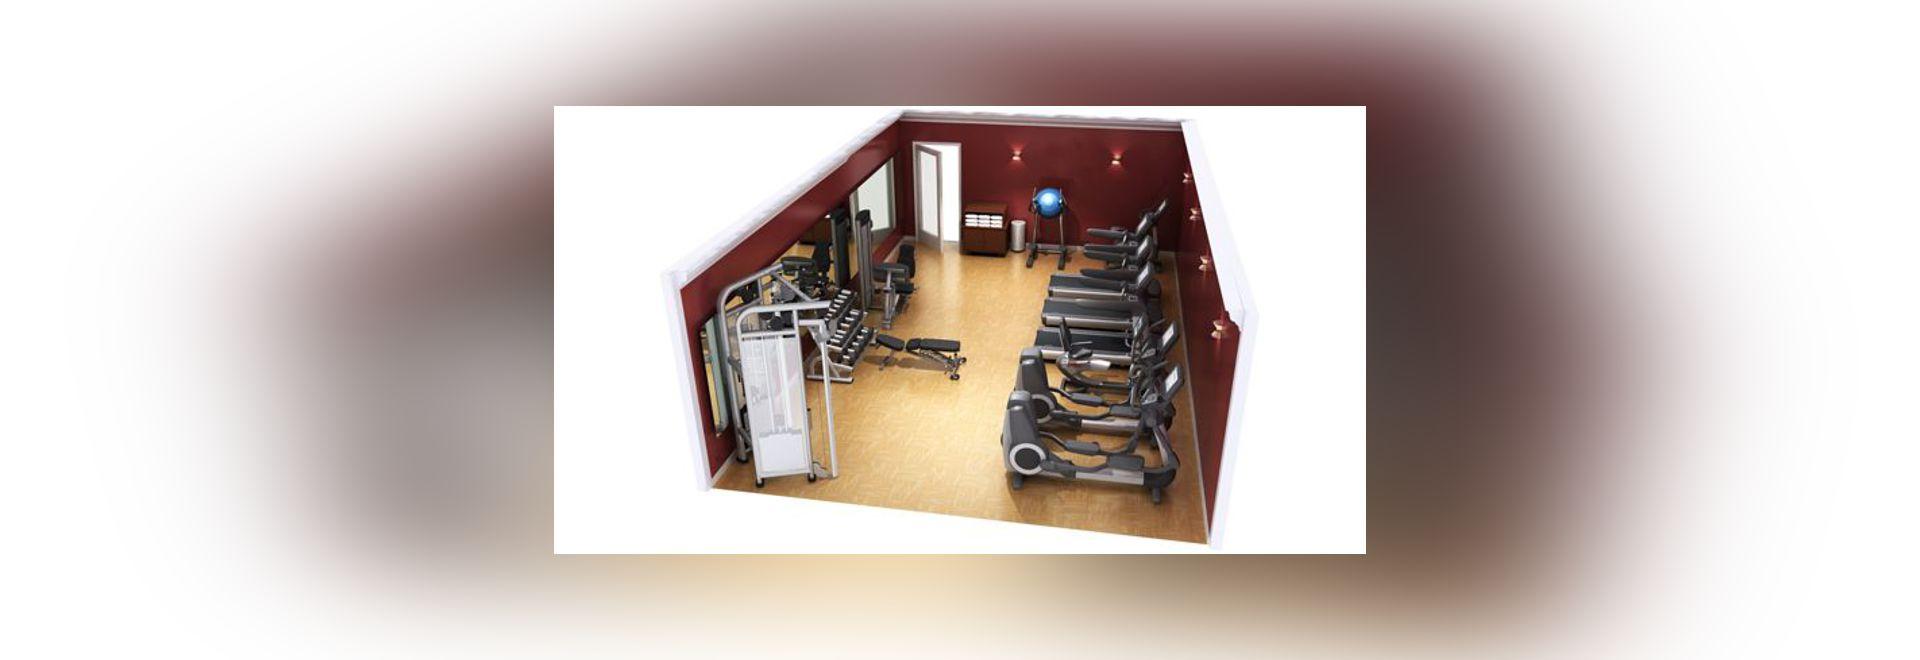 Gym company marine release cad blocks bath and north east somerset uk